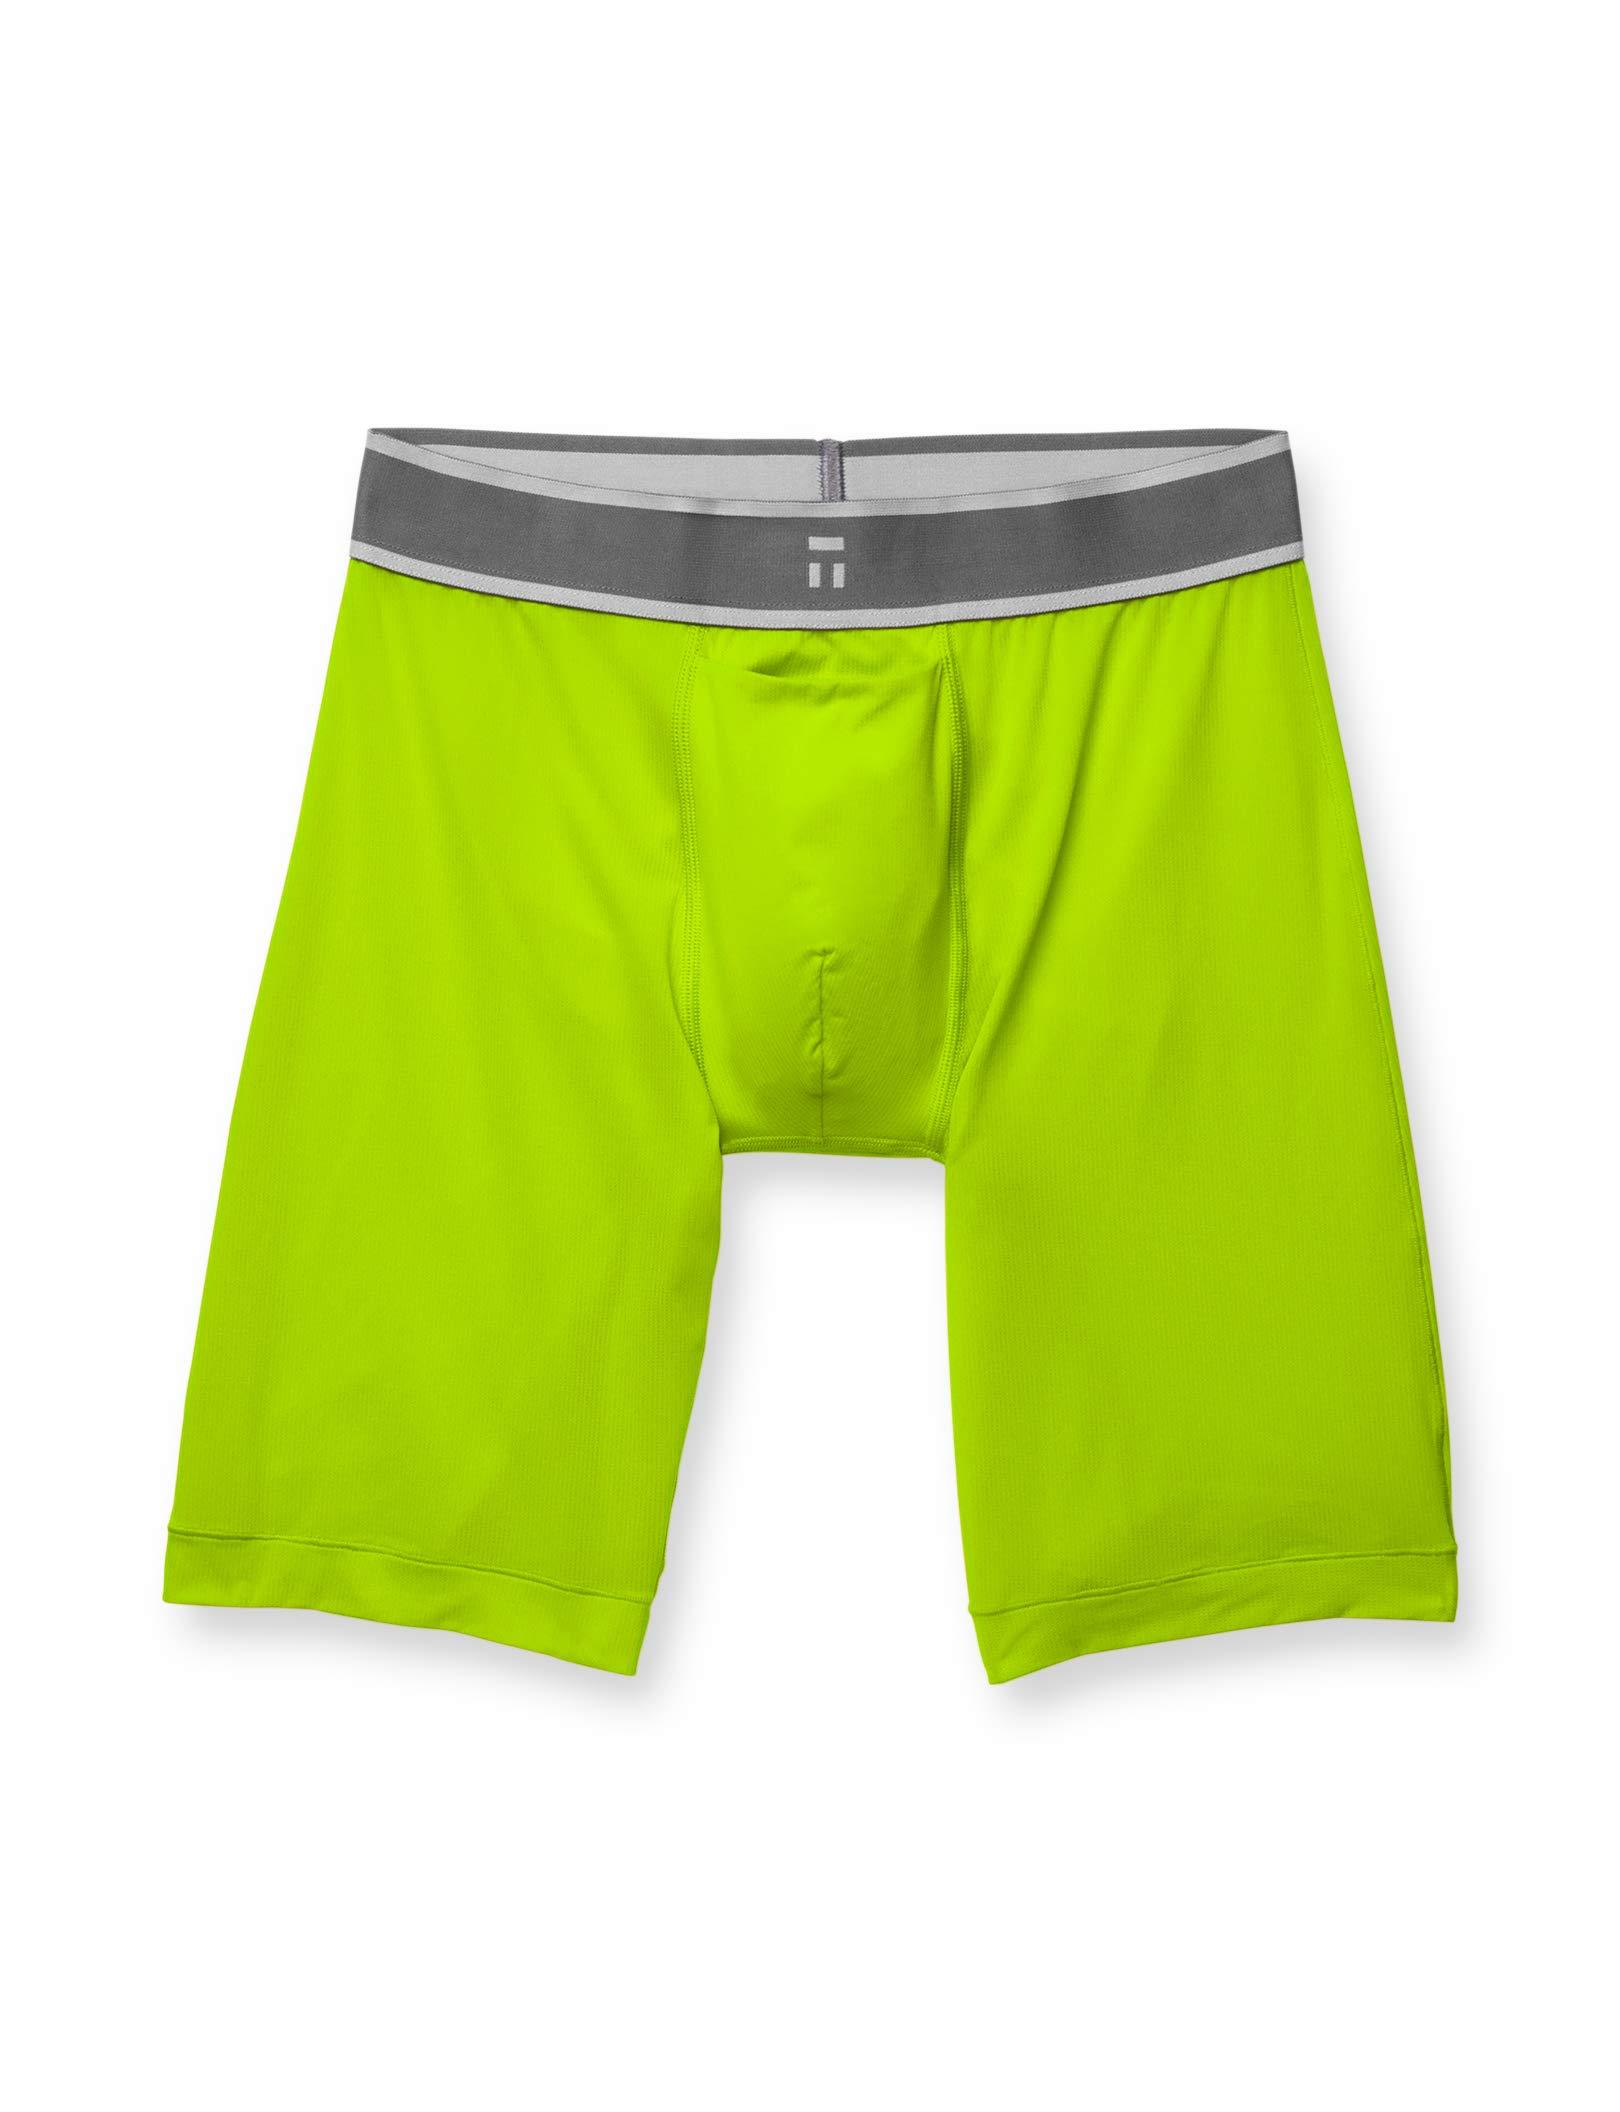 Tommy John Men's Air Boxer Briefs - No Ride-Up Comfortable Breathable Underwear for Men